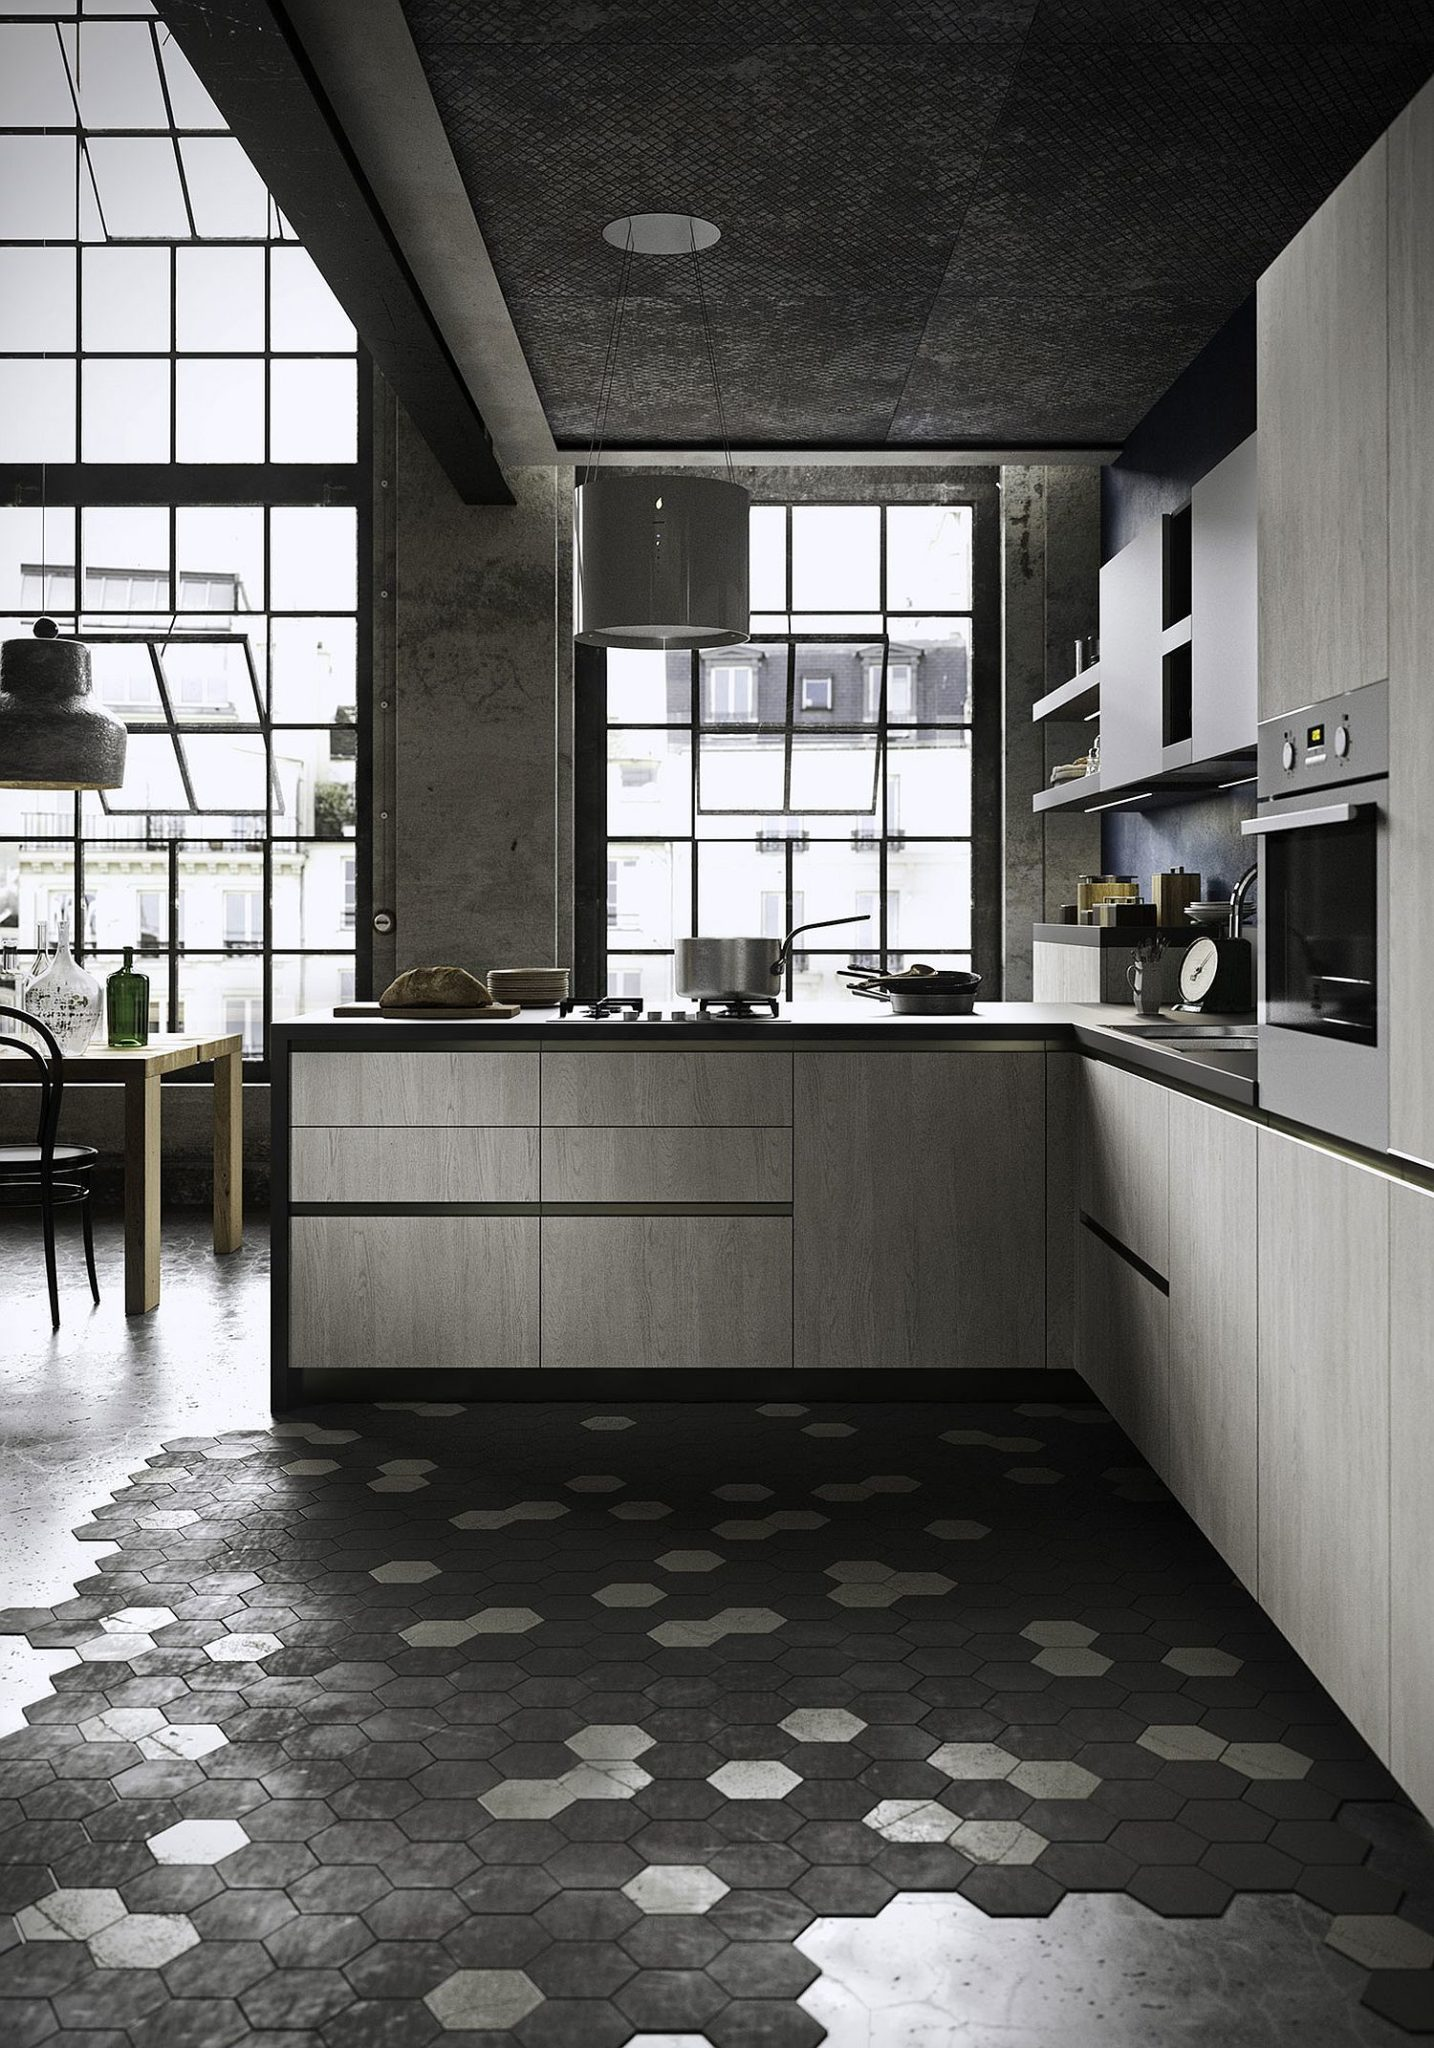 Ultra-minimal kitchen with hexagonal floor tiles